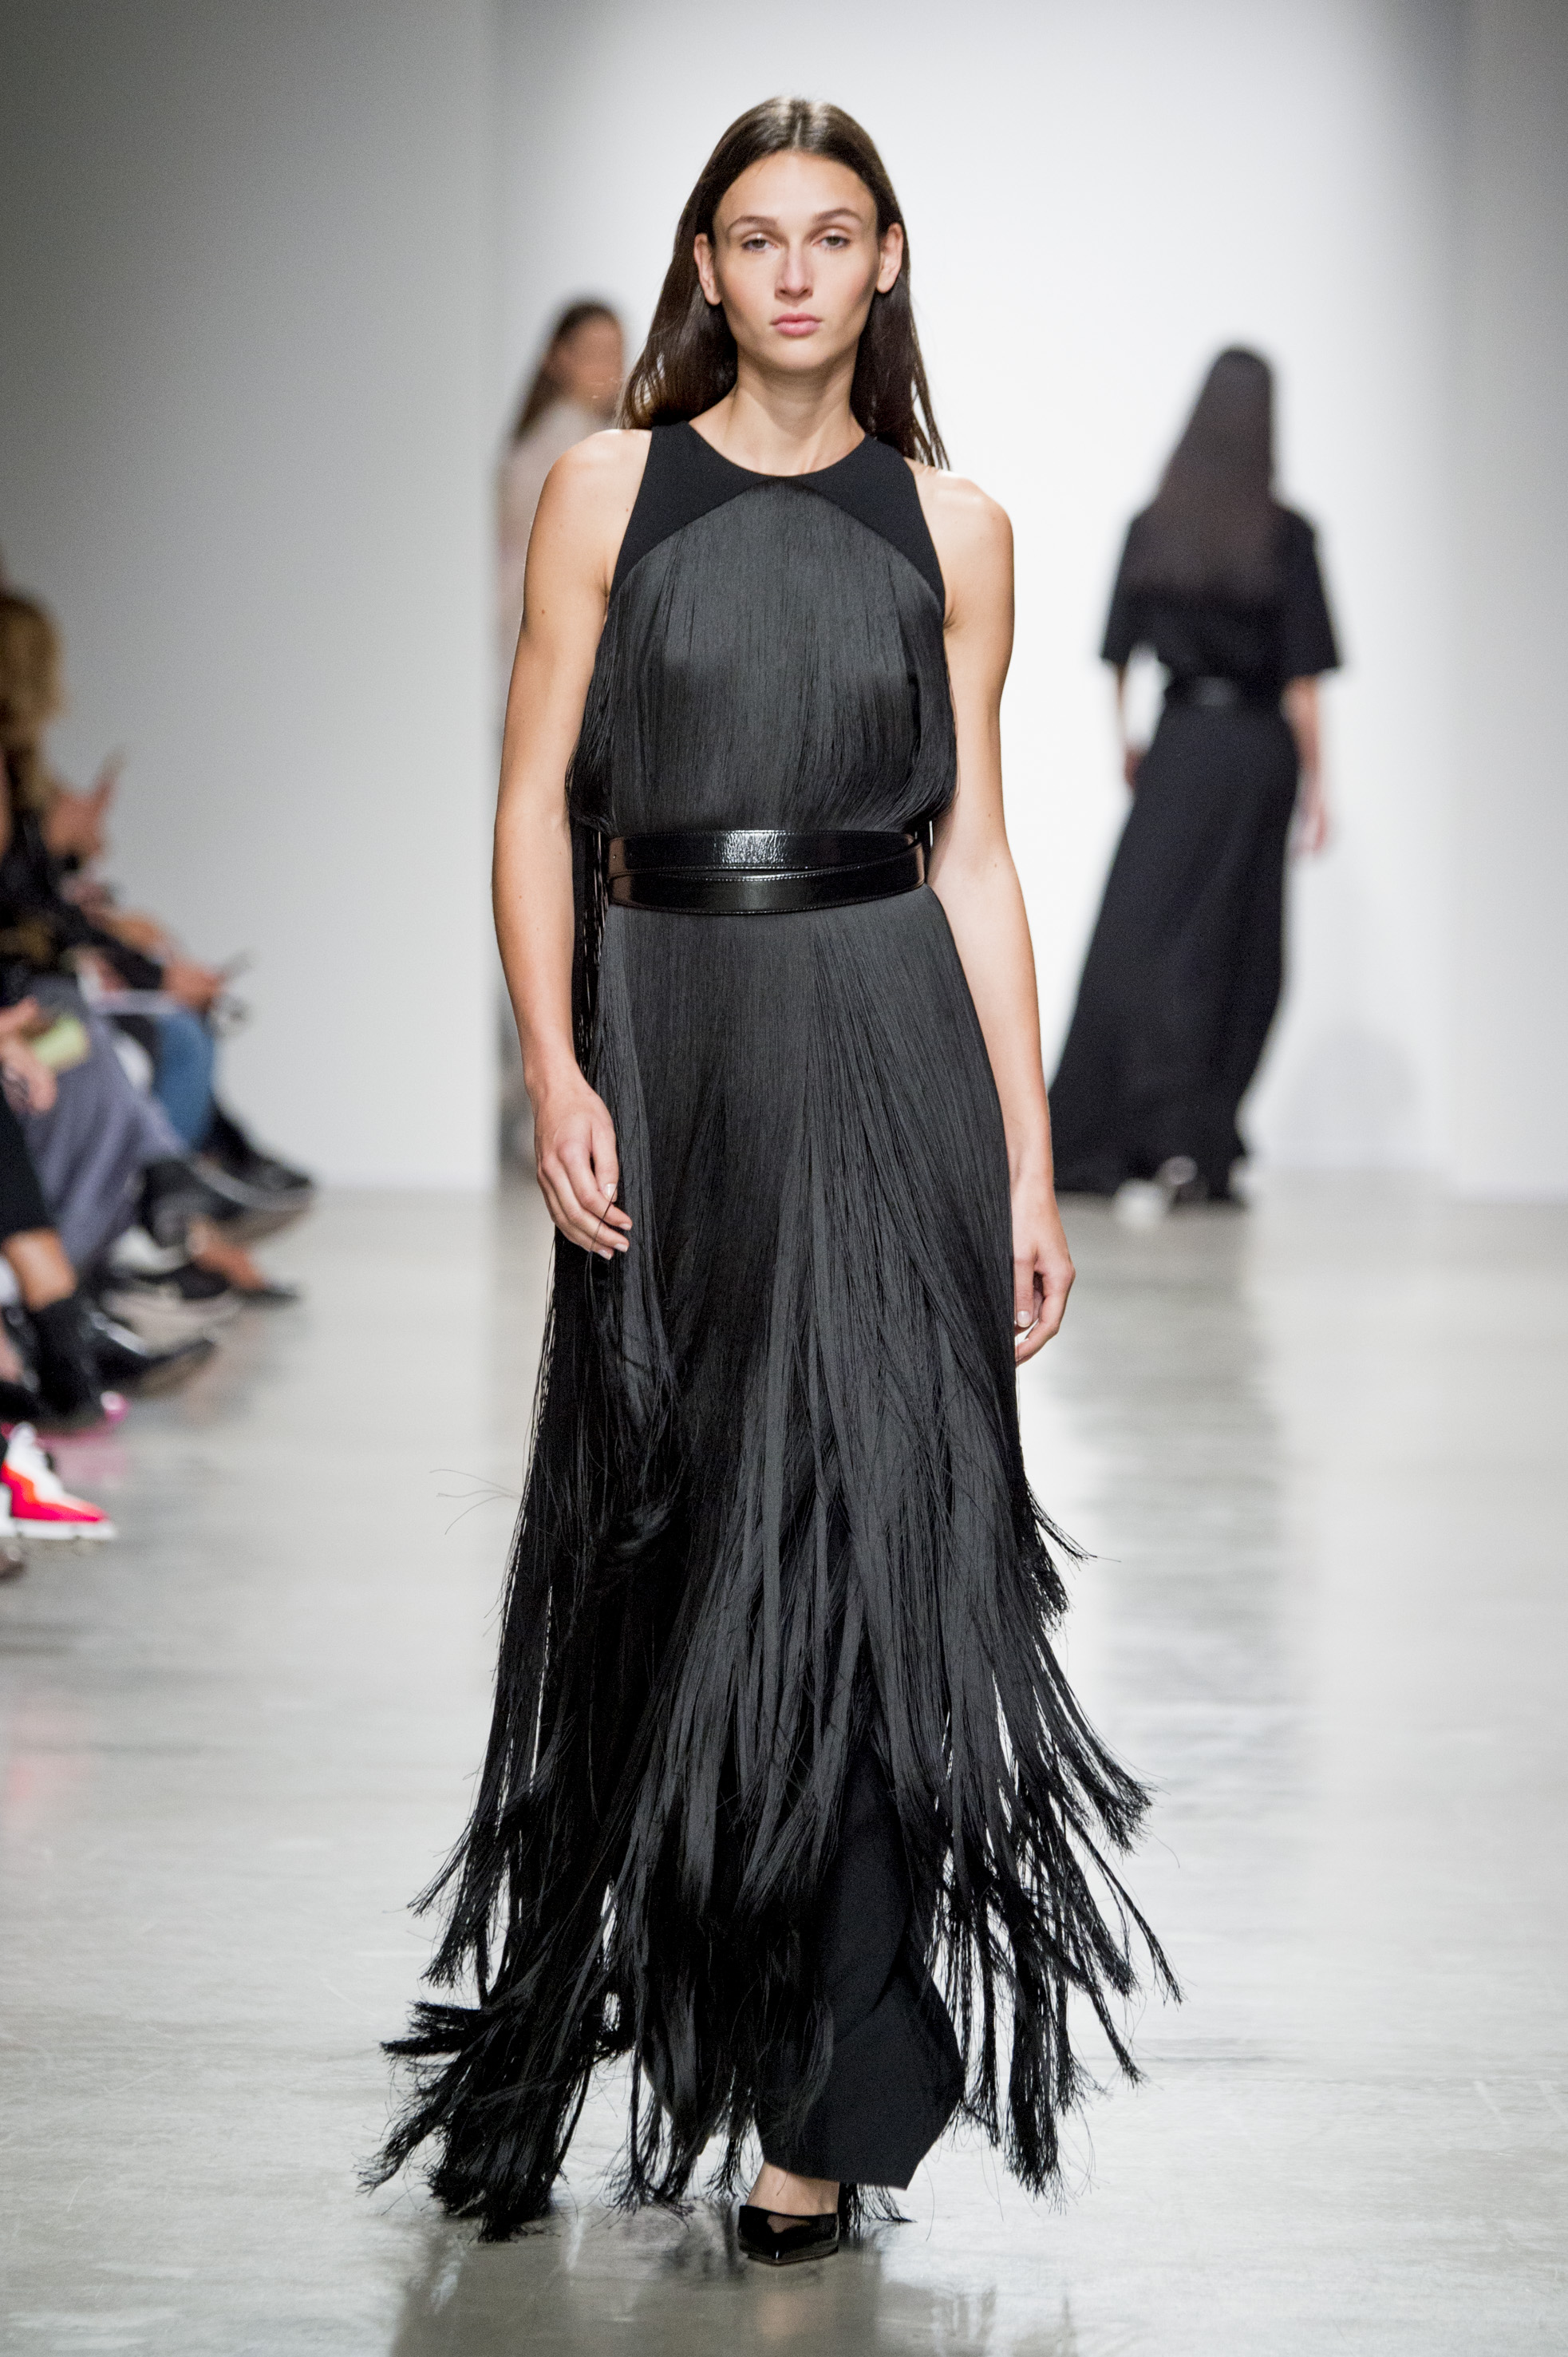 la-boite-d-allumettes-kristina-fidelskaya-ss20-paris-fashion-week-pfw-2019-summer